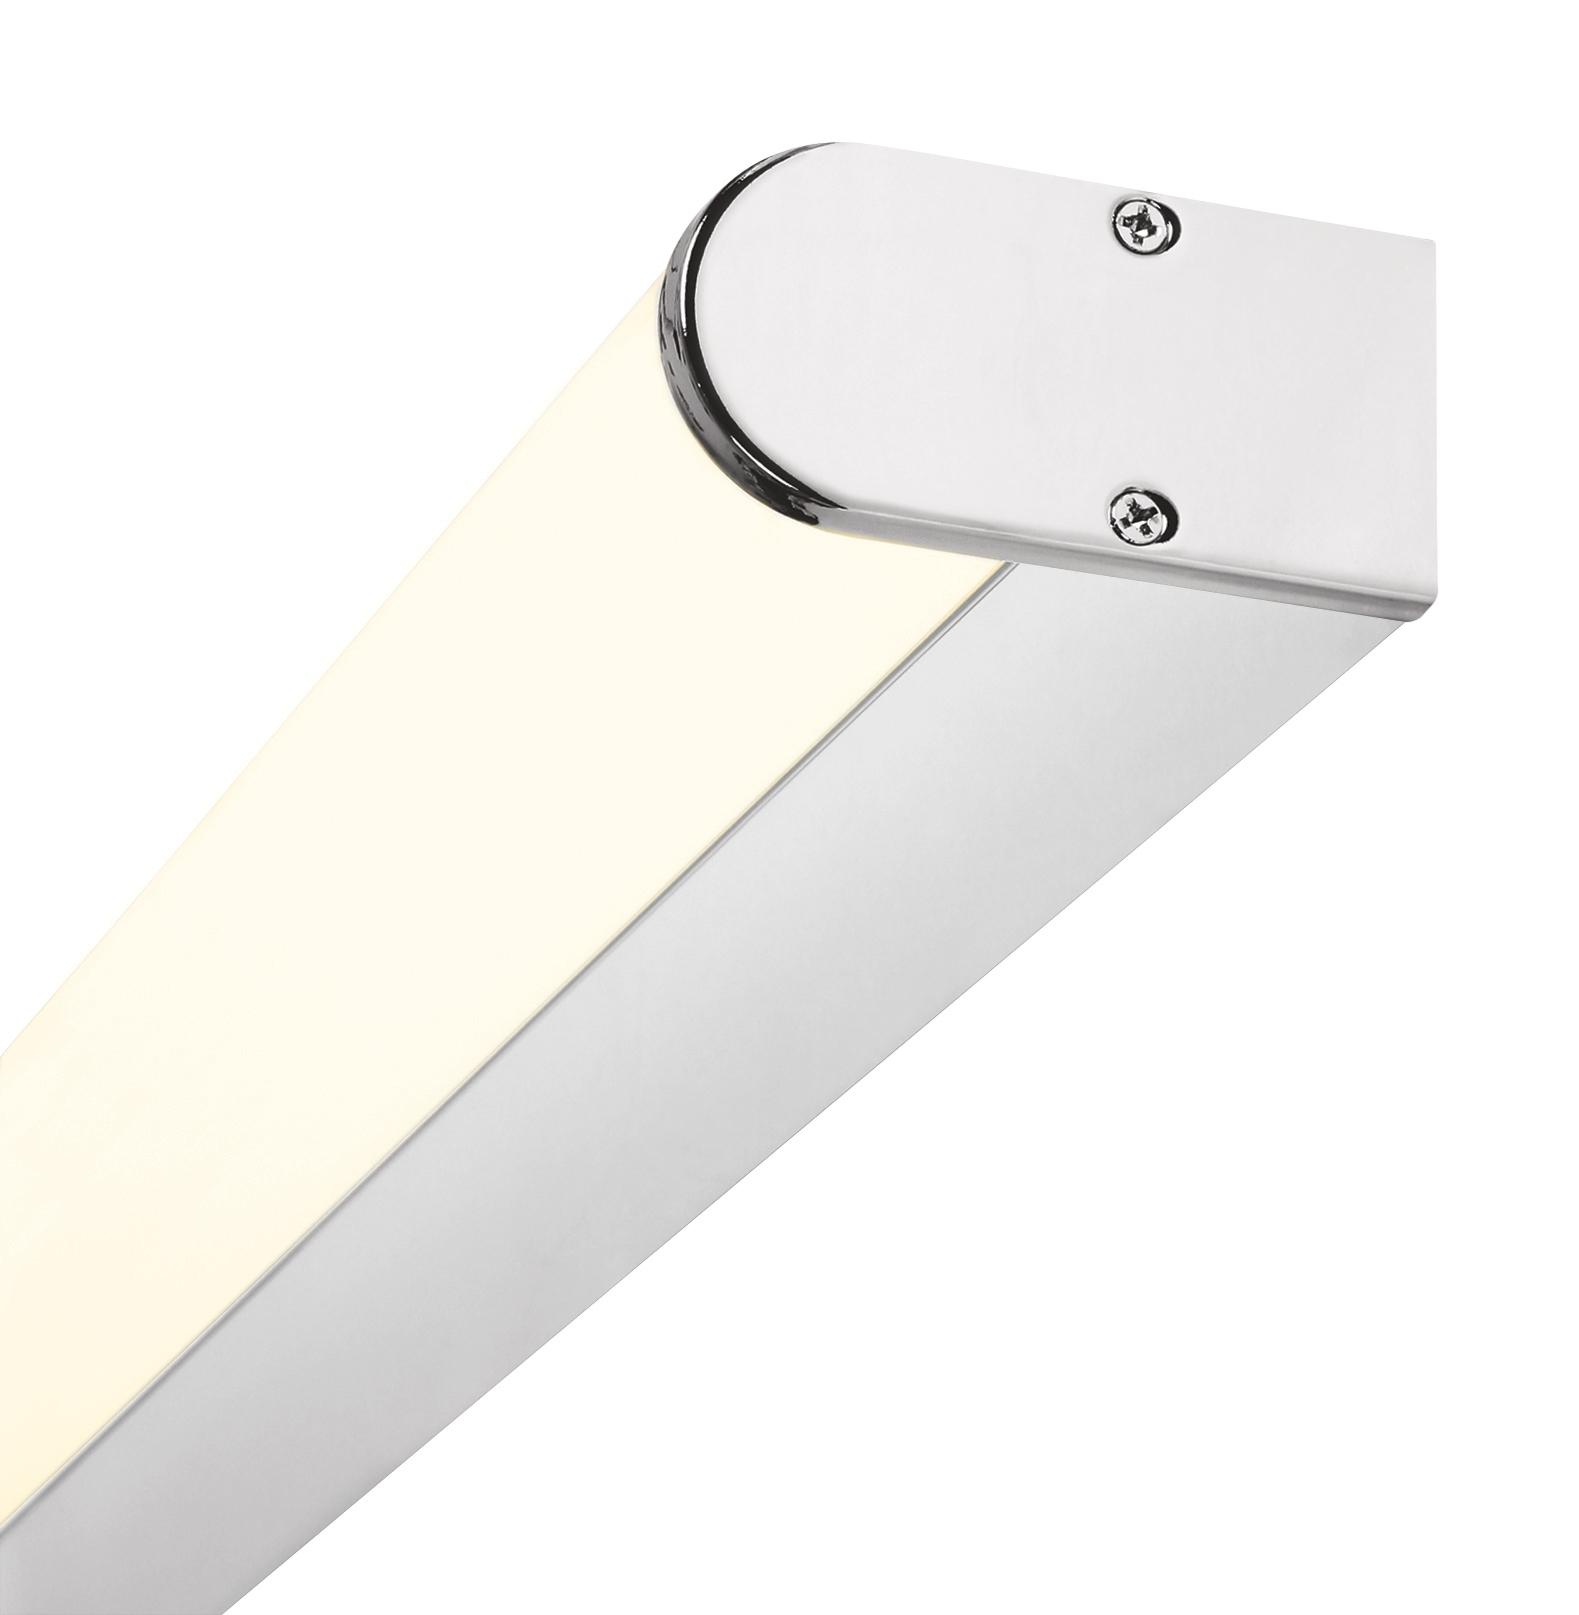 Bath Round Small, LED, 23W, 3000K, 1650lm, IP44, chrom